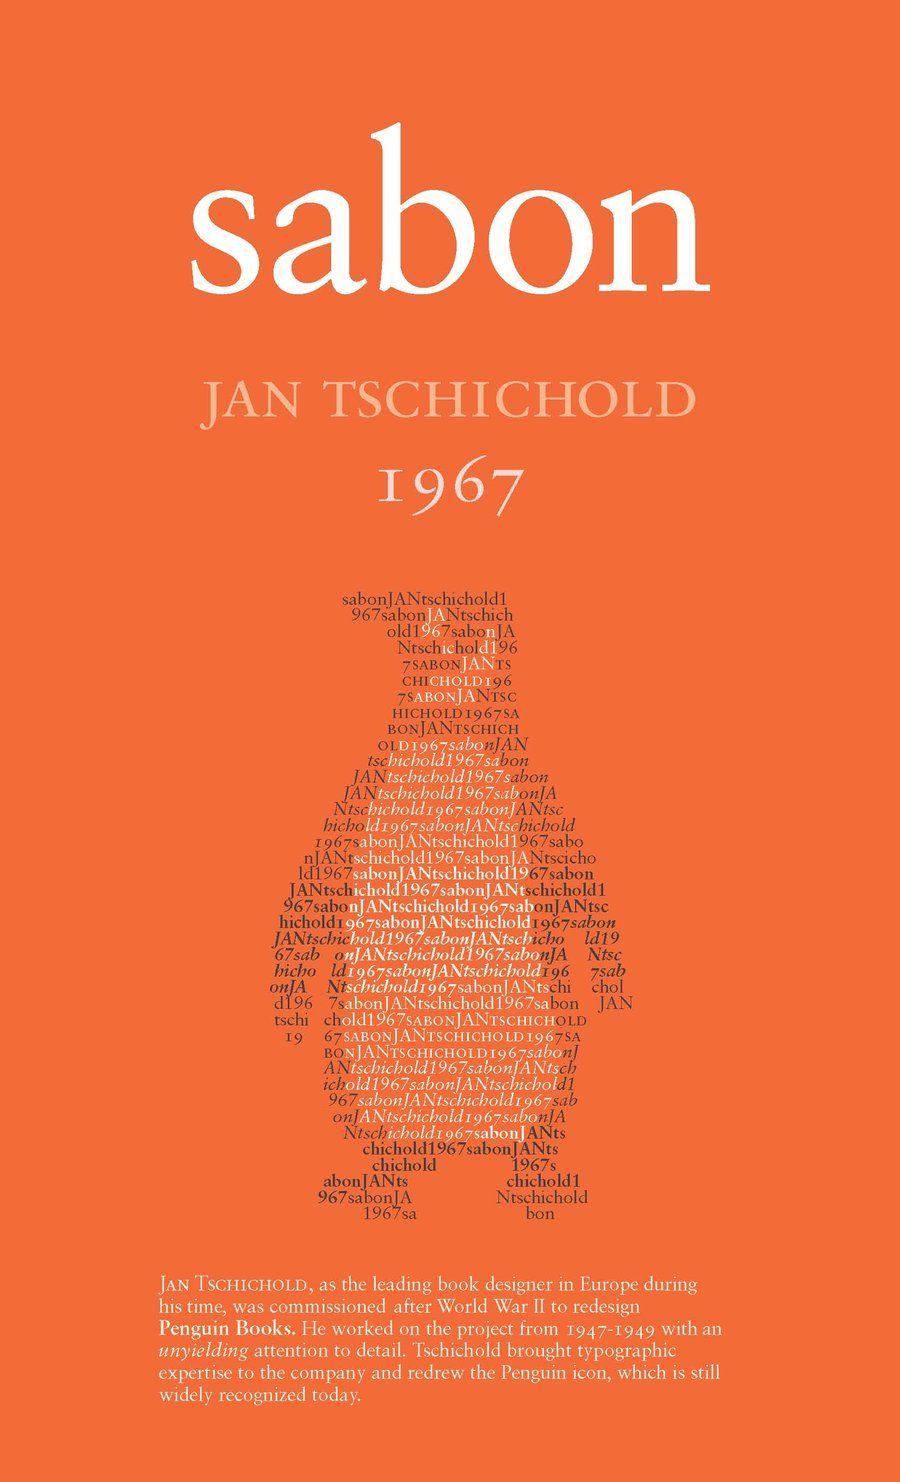 Penguin Book Cover Font : Sabon penguin books pinterest